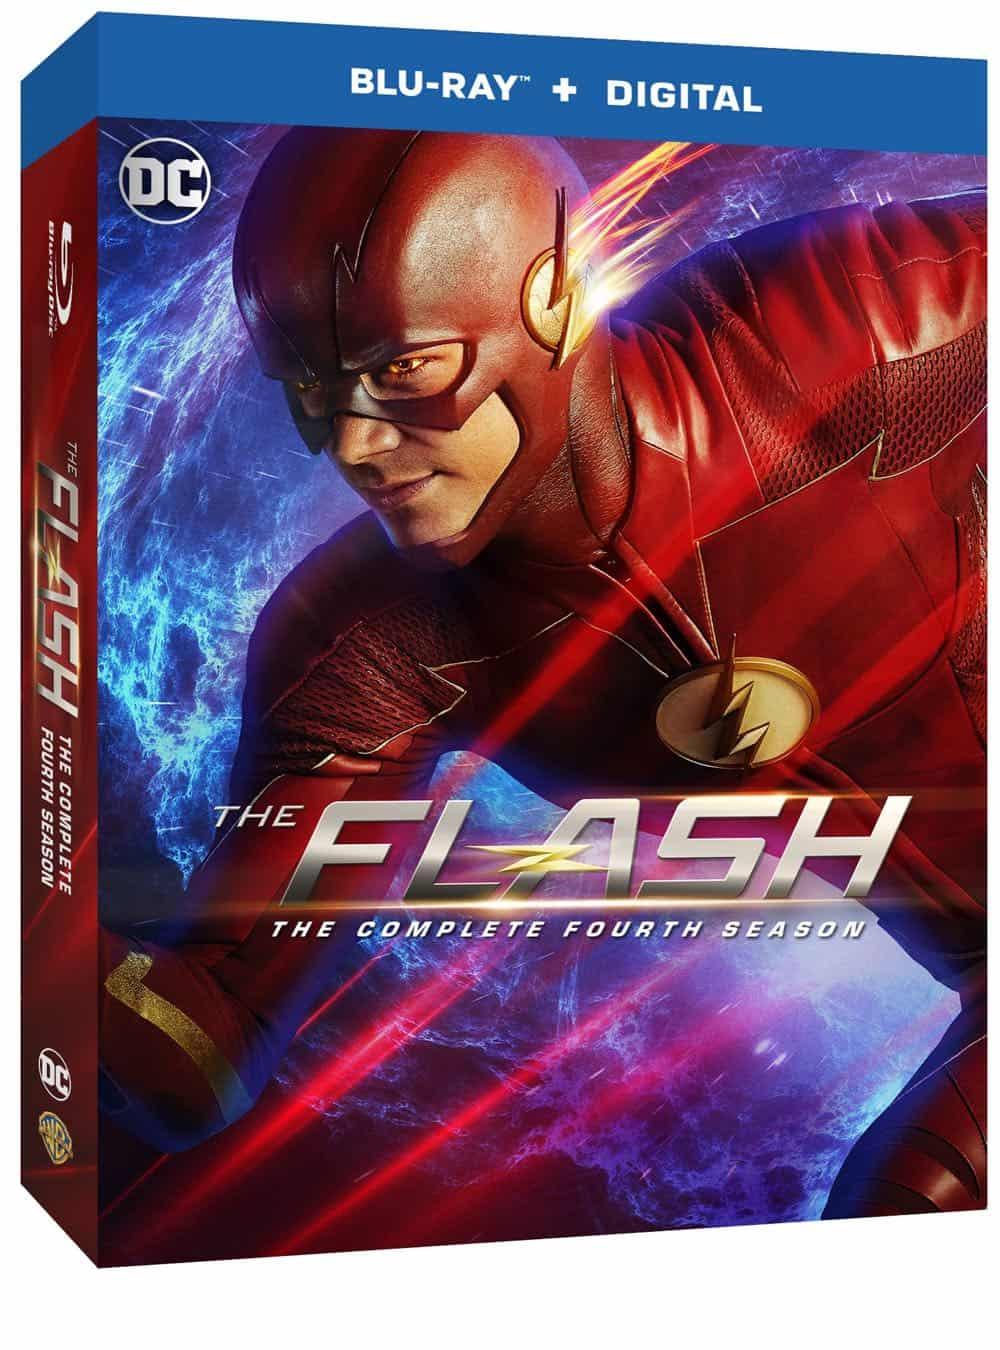 The-Flash-Season-4-Bluray-Digital-Cover-1